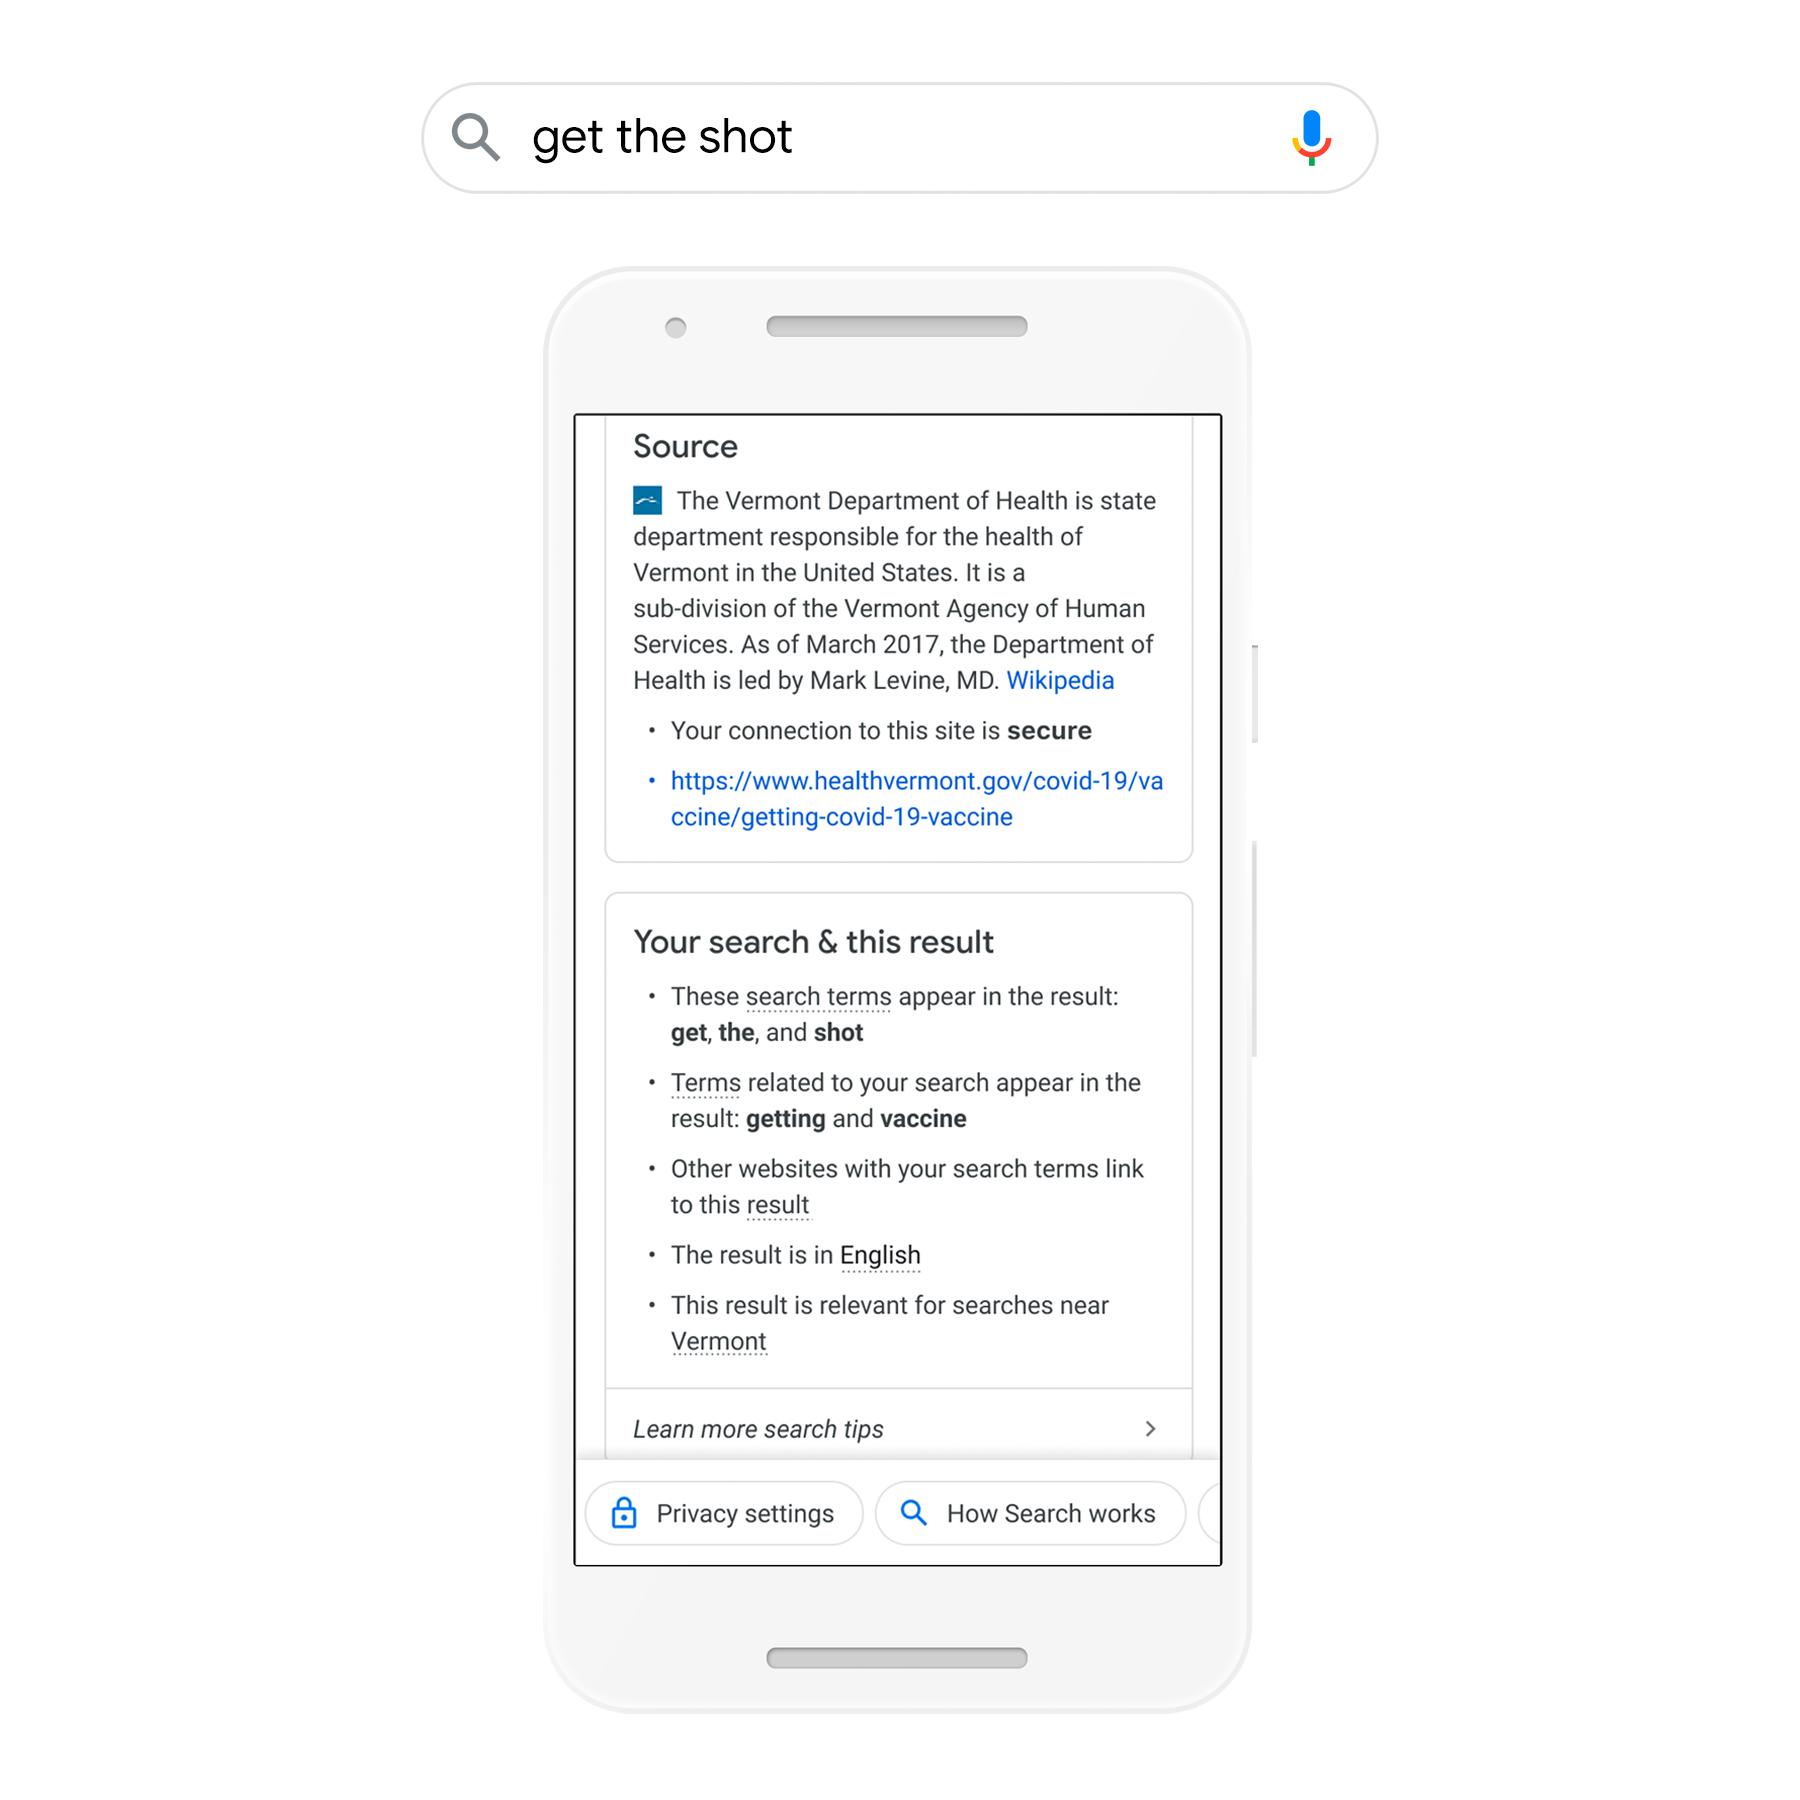 Google expande 'Acerca de este resultado' con información sobre factores de clasificación